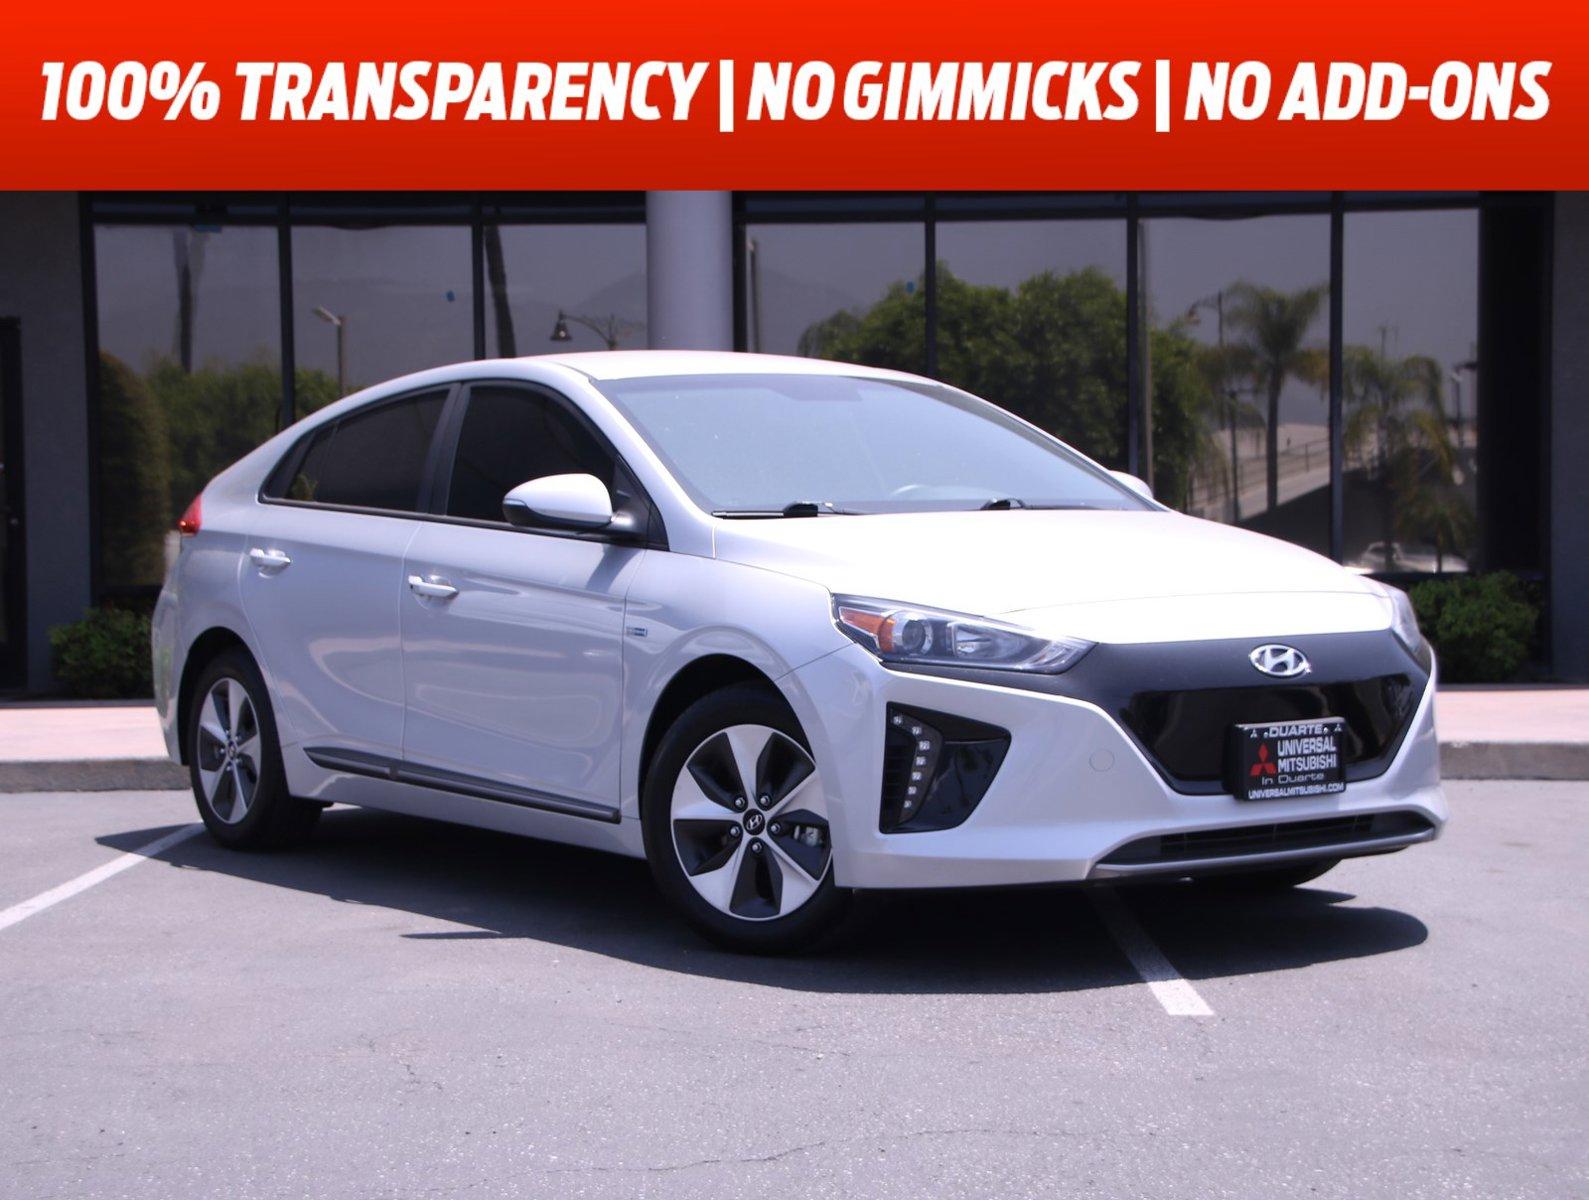 2019 Hyundai Ioniq Electric Hatchback Electric [2]